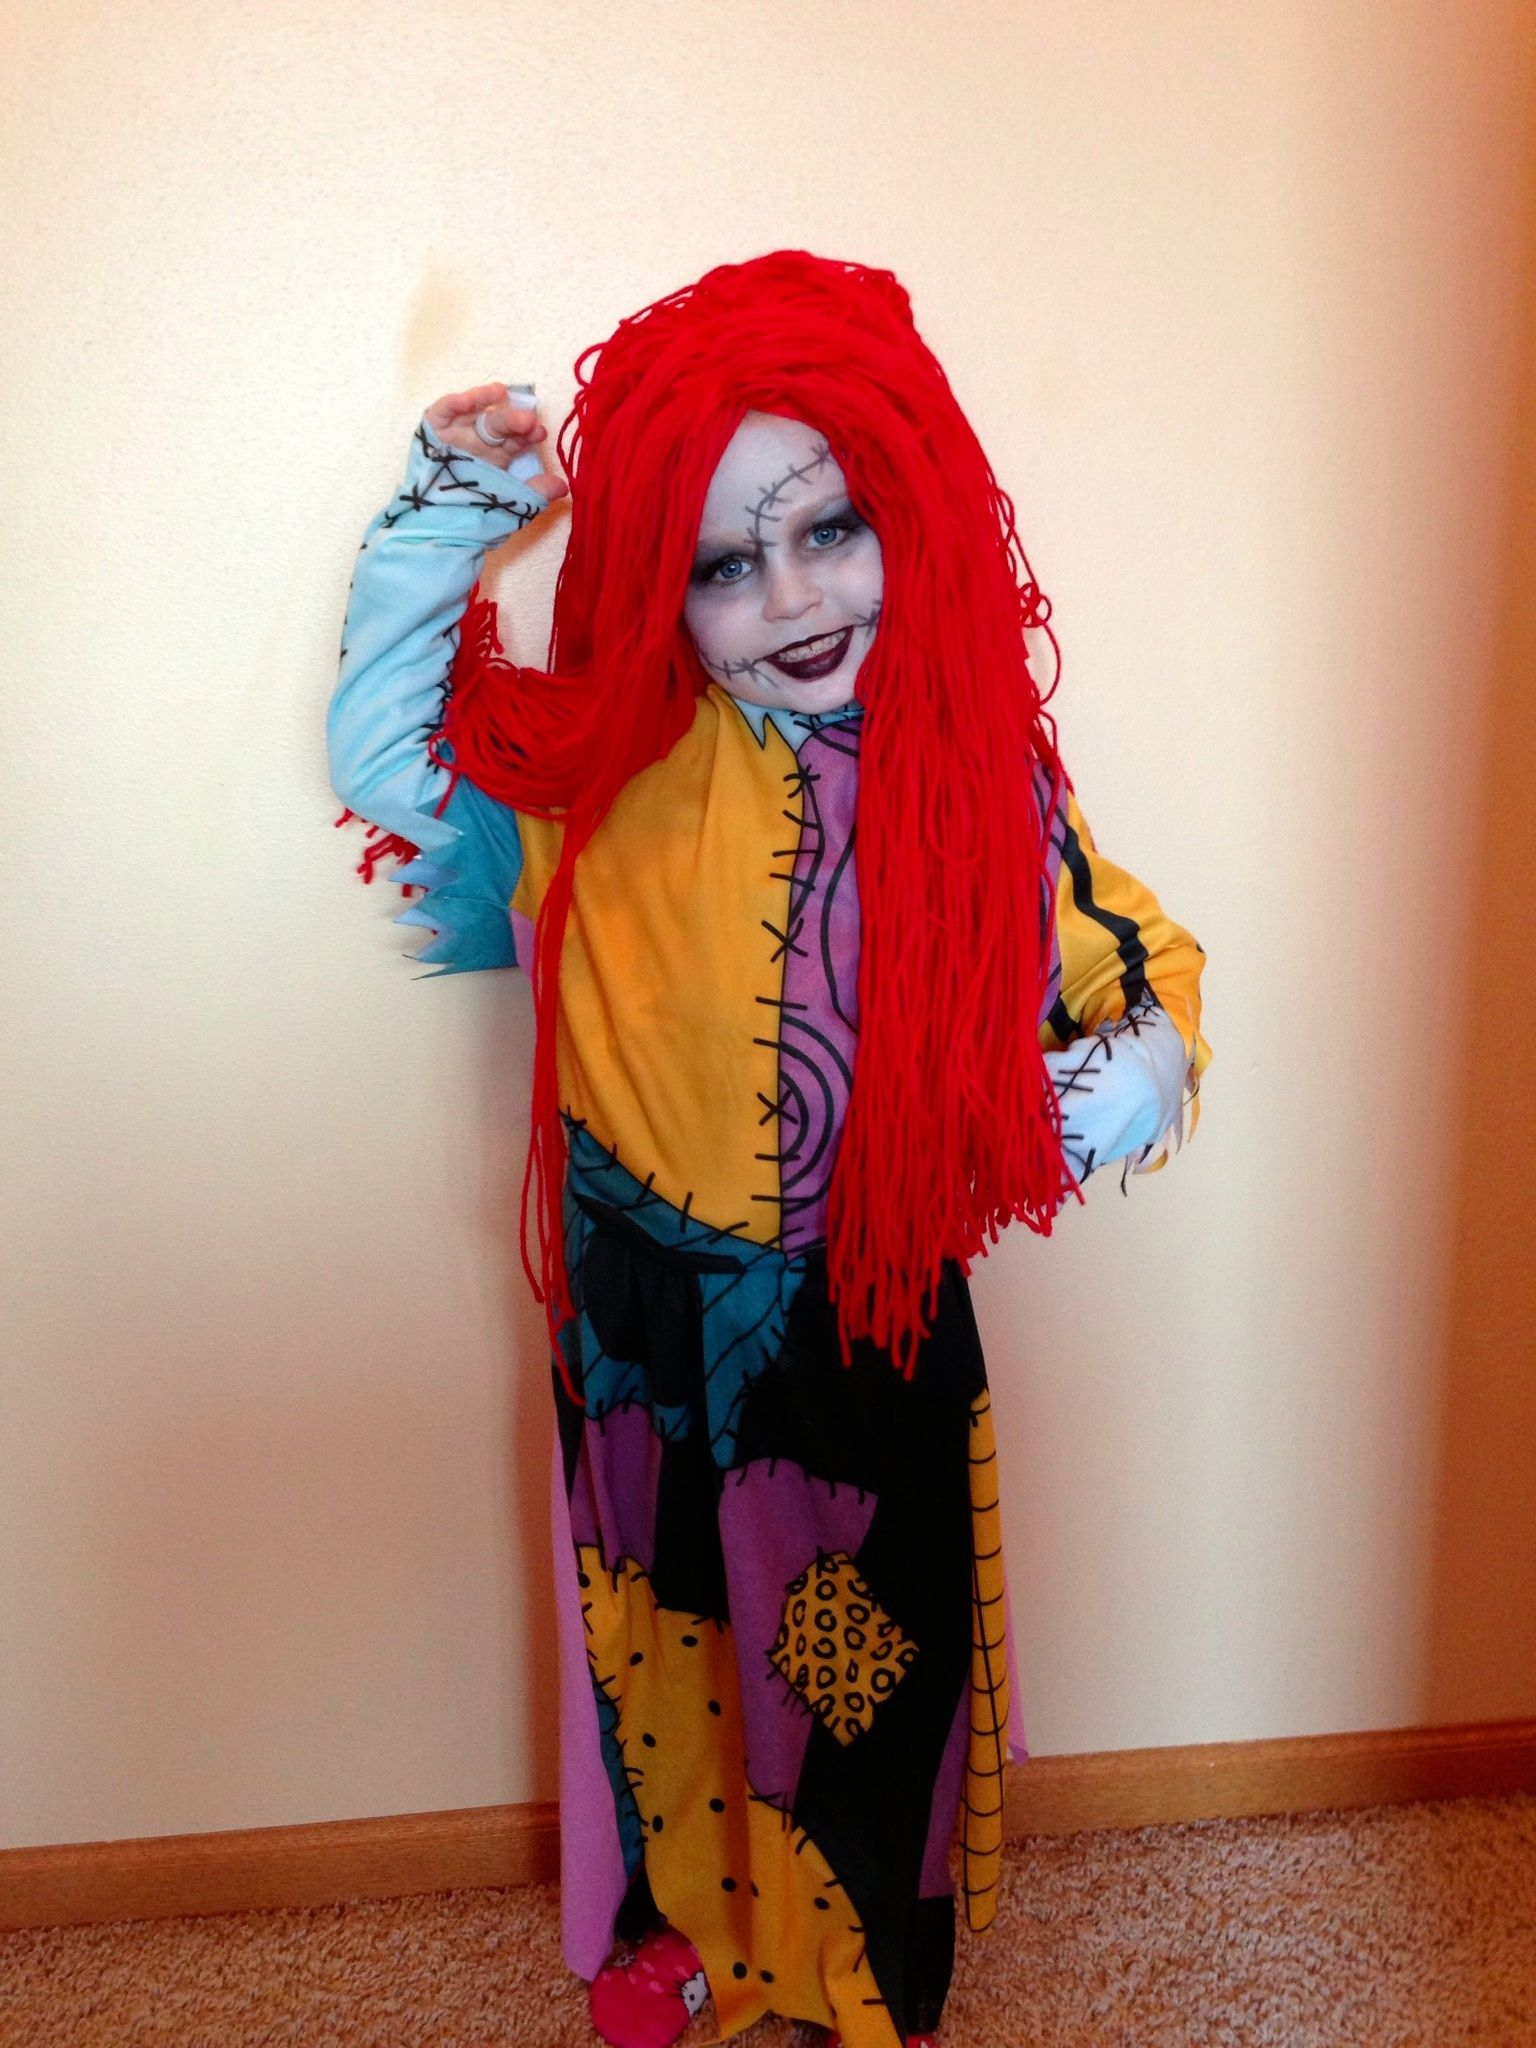 Sally the nightmare before Christmas Halloween makeup. OMG